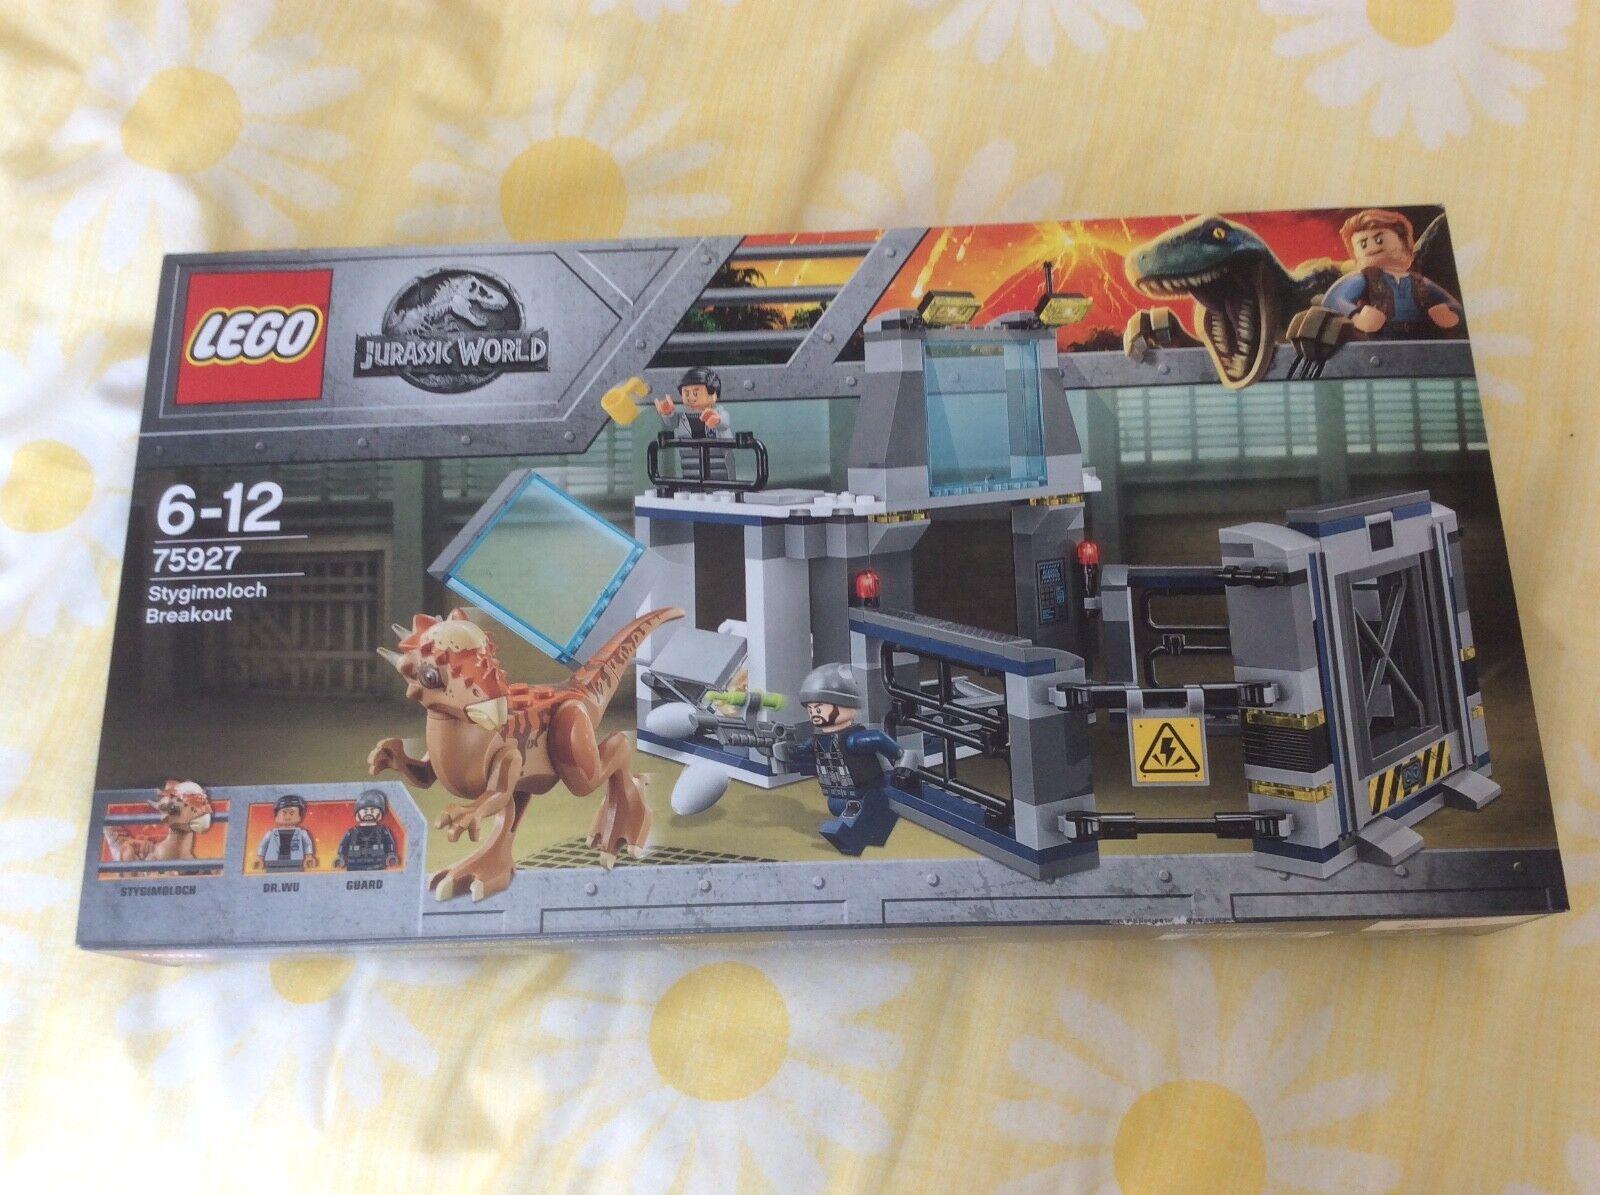 Lego Jurassic World 75927 Stygimoloch Breakout Brand New & Sealed